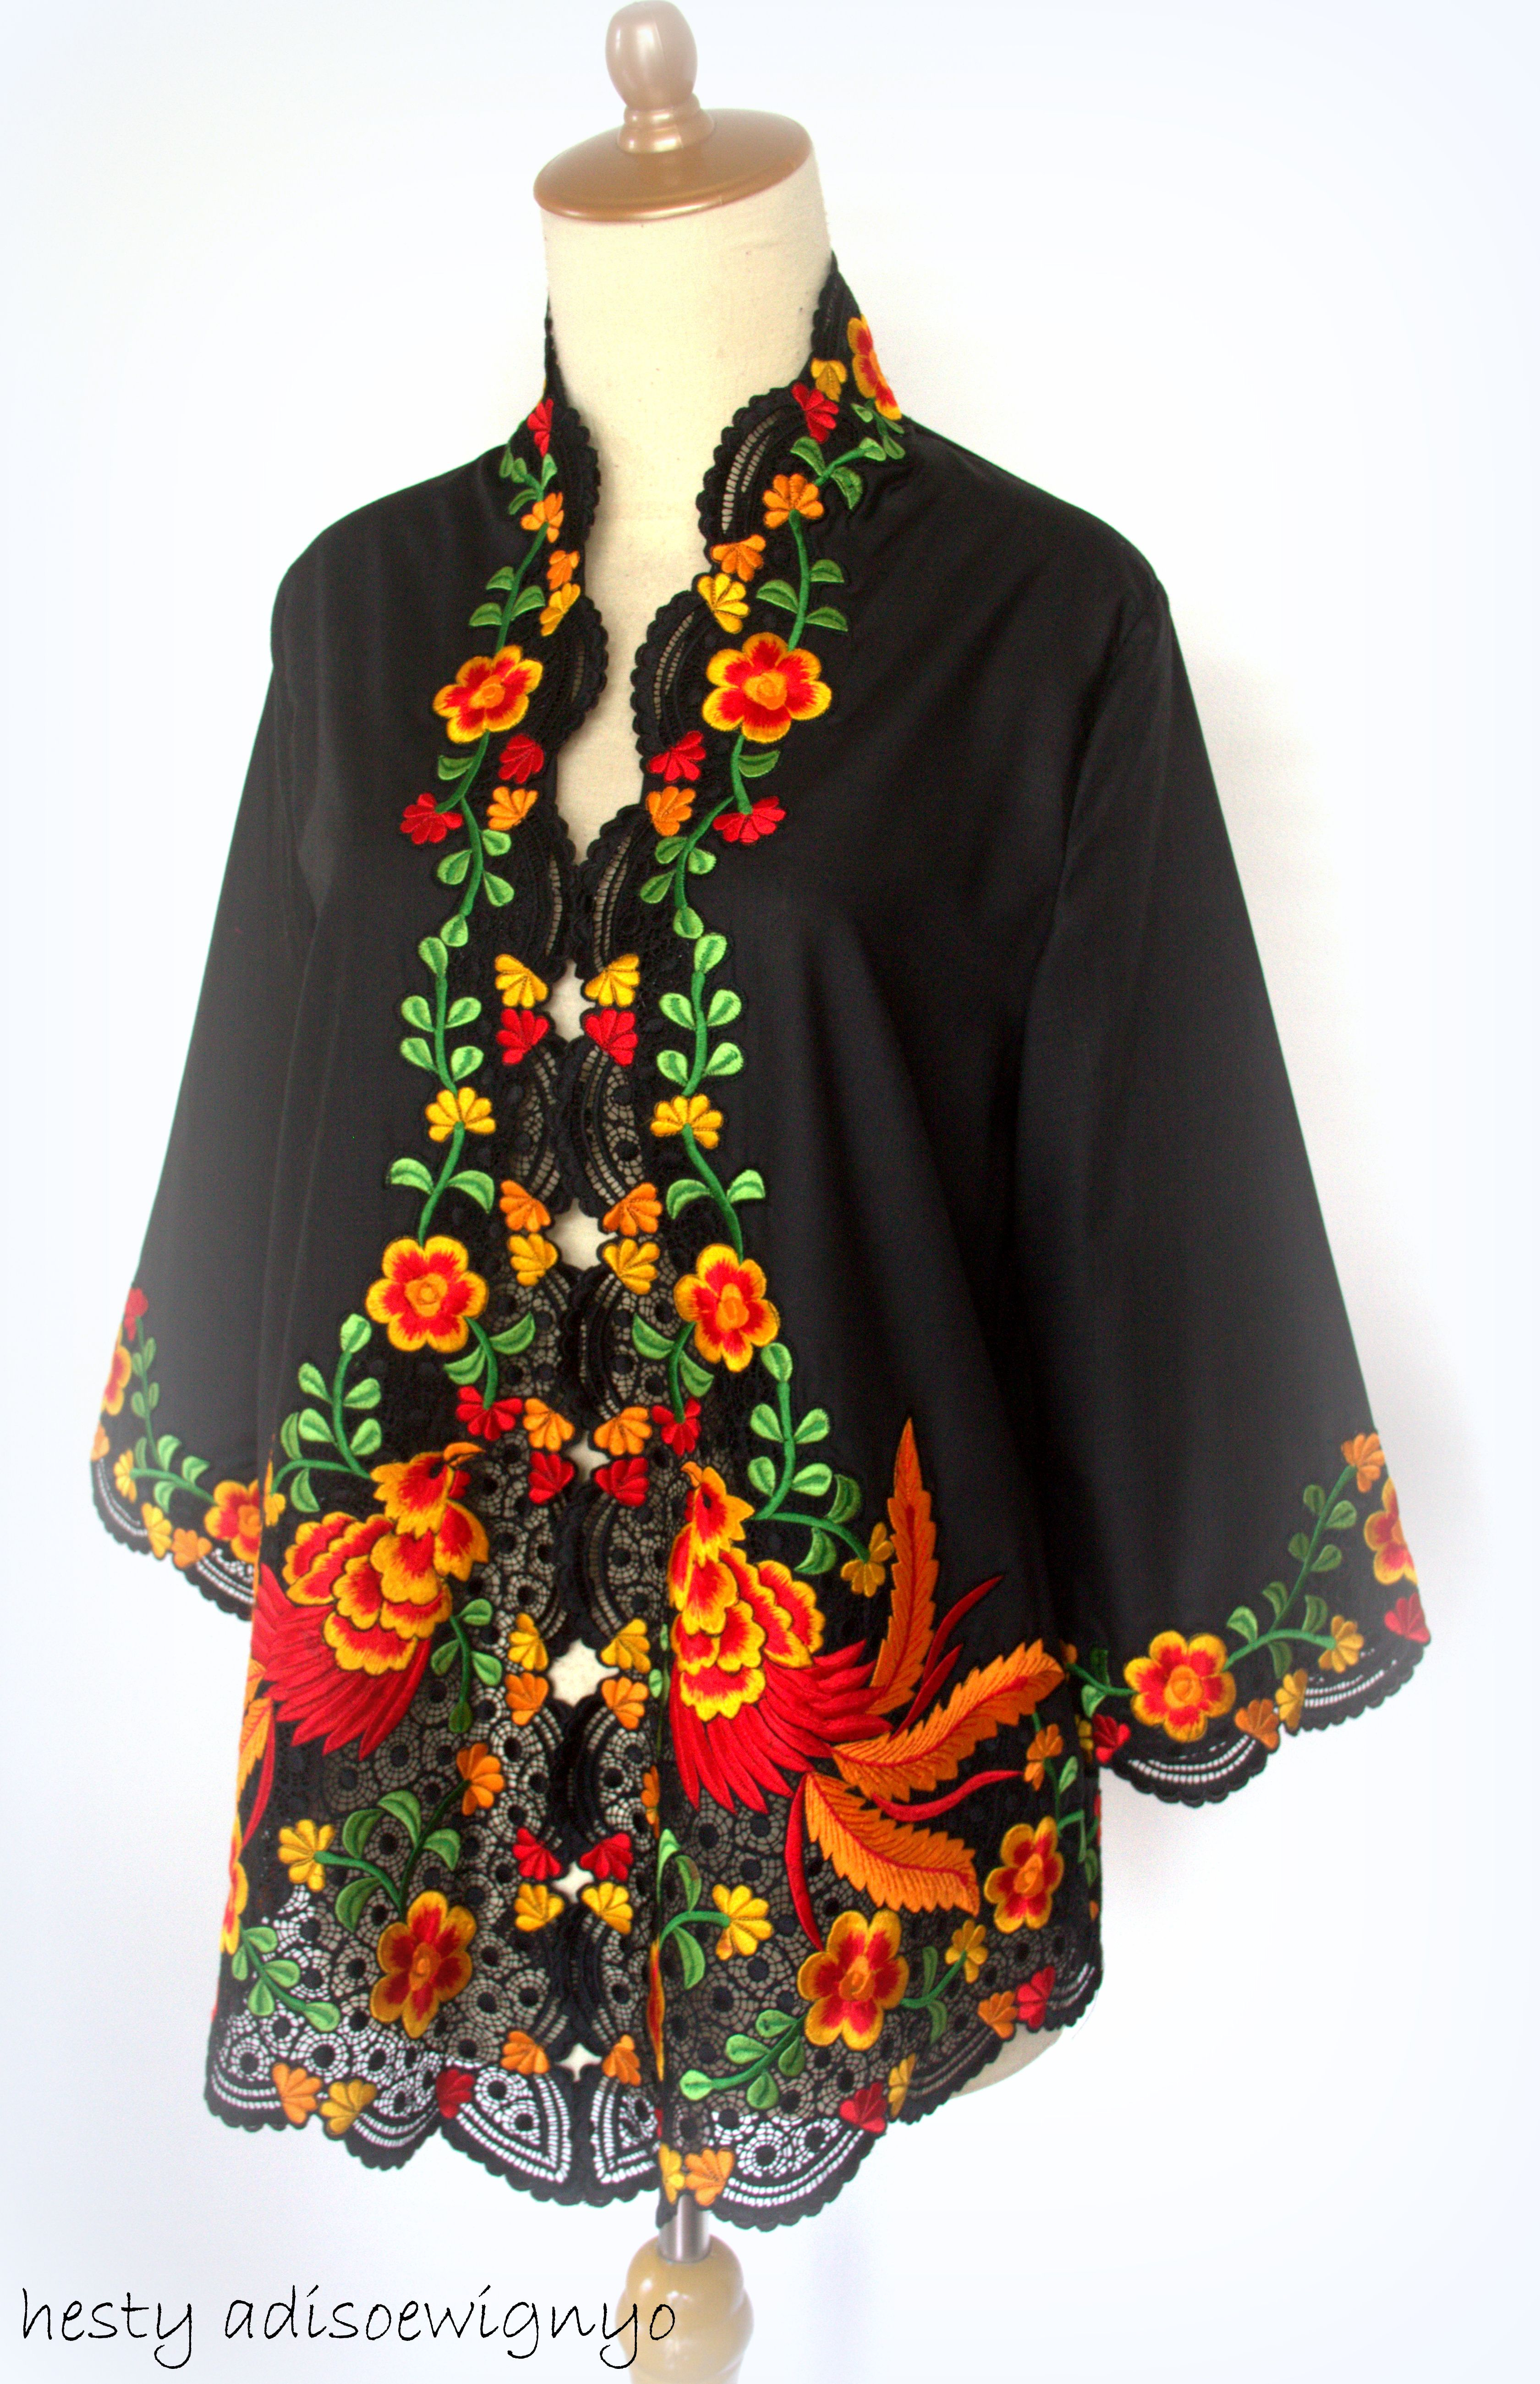 Malay kebaya kimono  Emblem  Pinterest  Kebaya Kimonos and